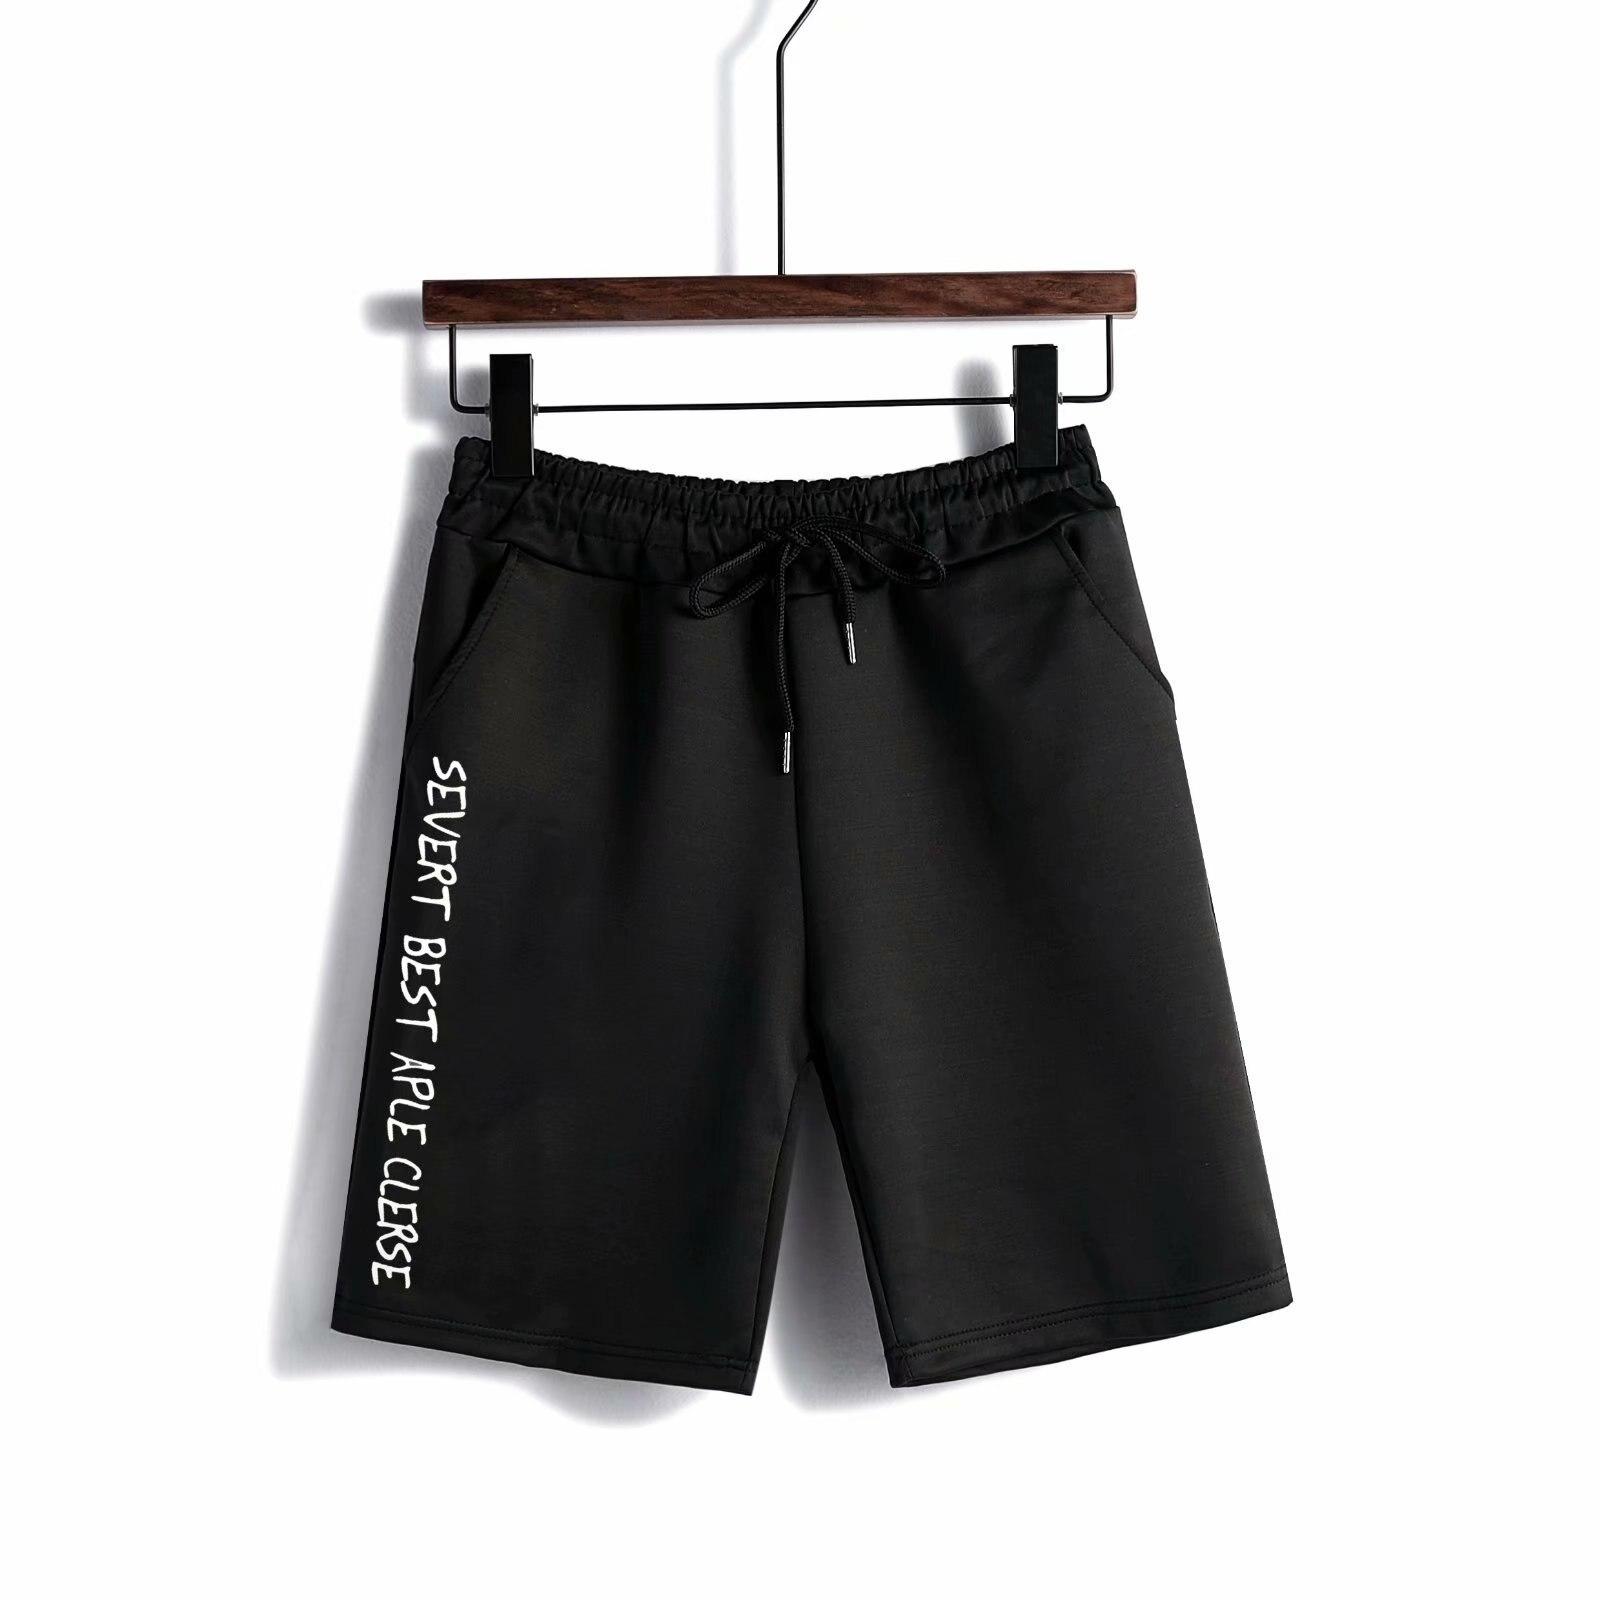 2019 Men Summer Chao Liu Ku Breathable Thin Casual Men's Cool 5 Sports Shorts Men's